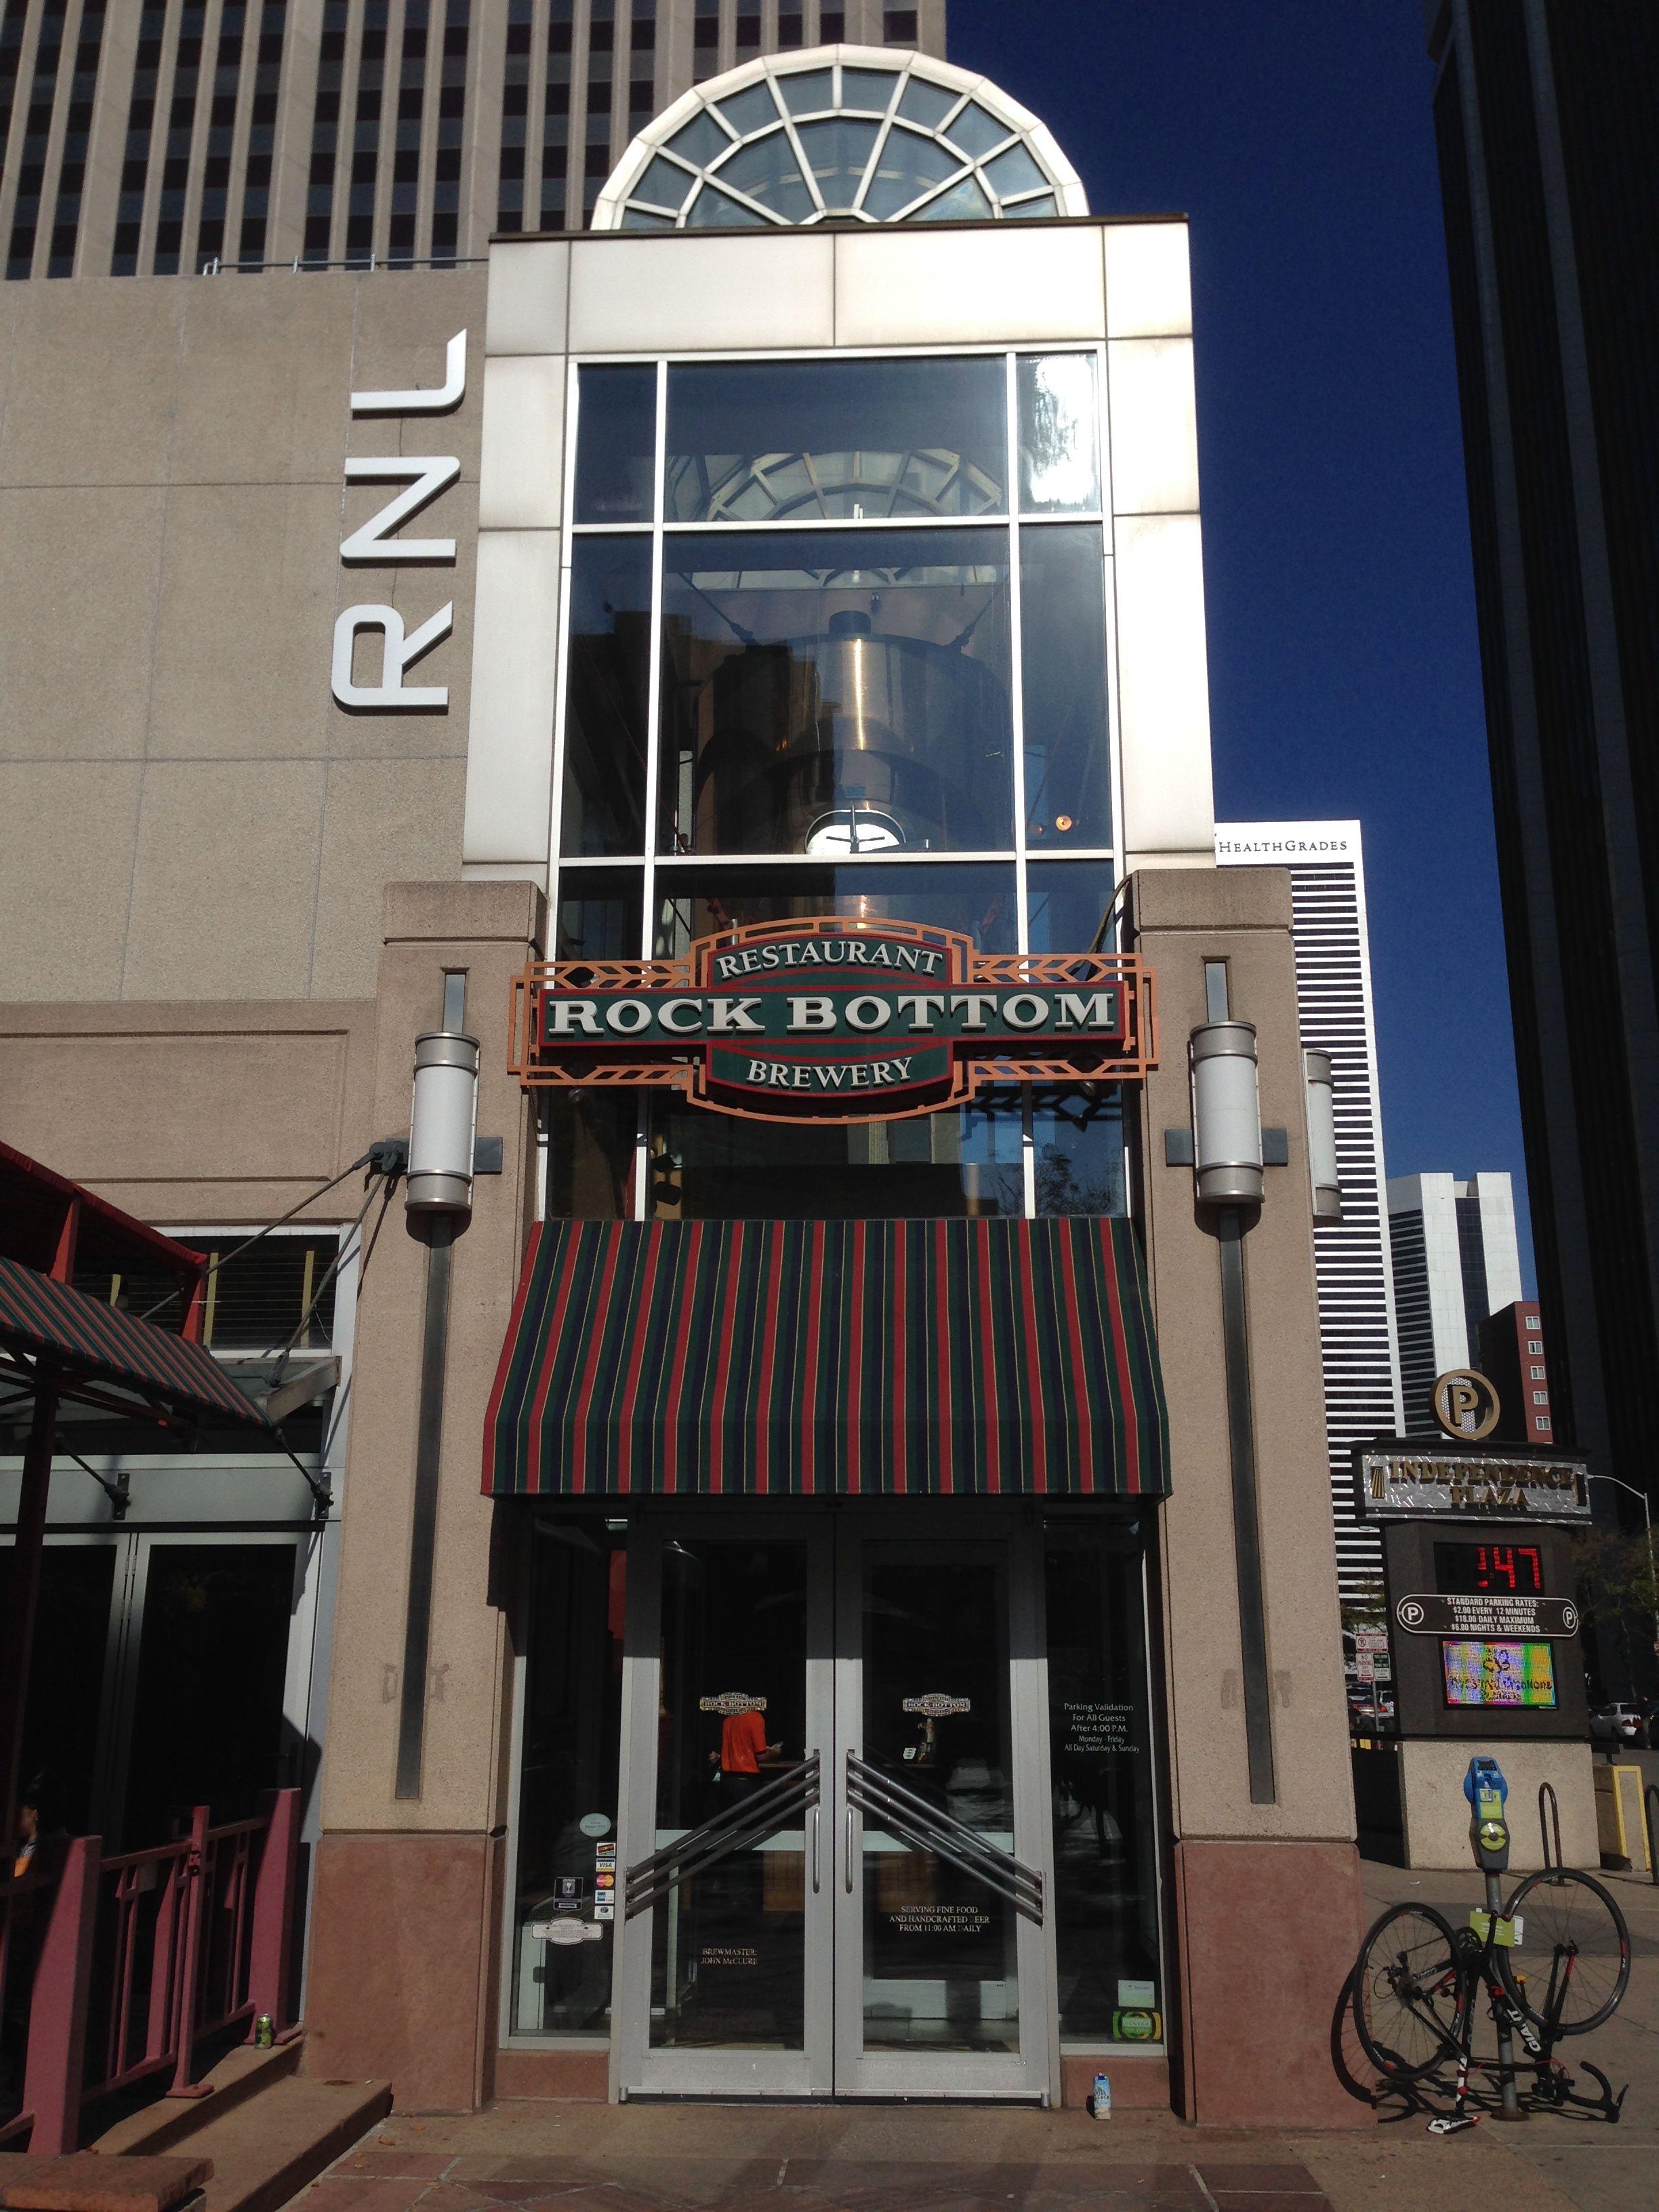 Rock Bottom Brewpub in Denver, Colorado. Where I hit rock bottom!!